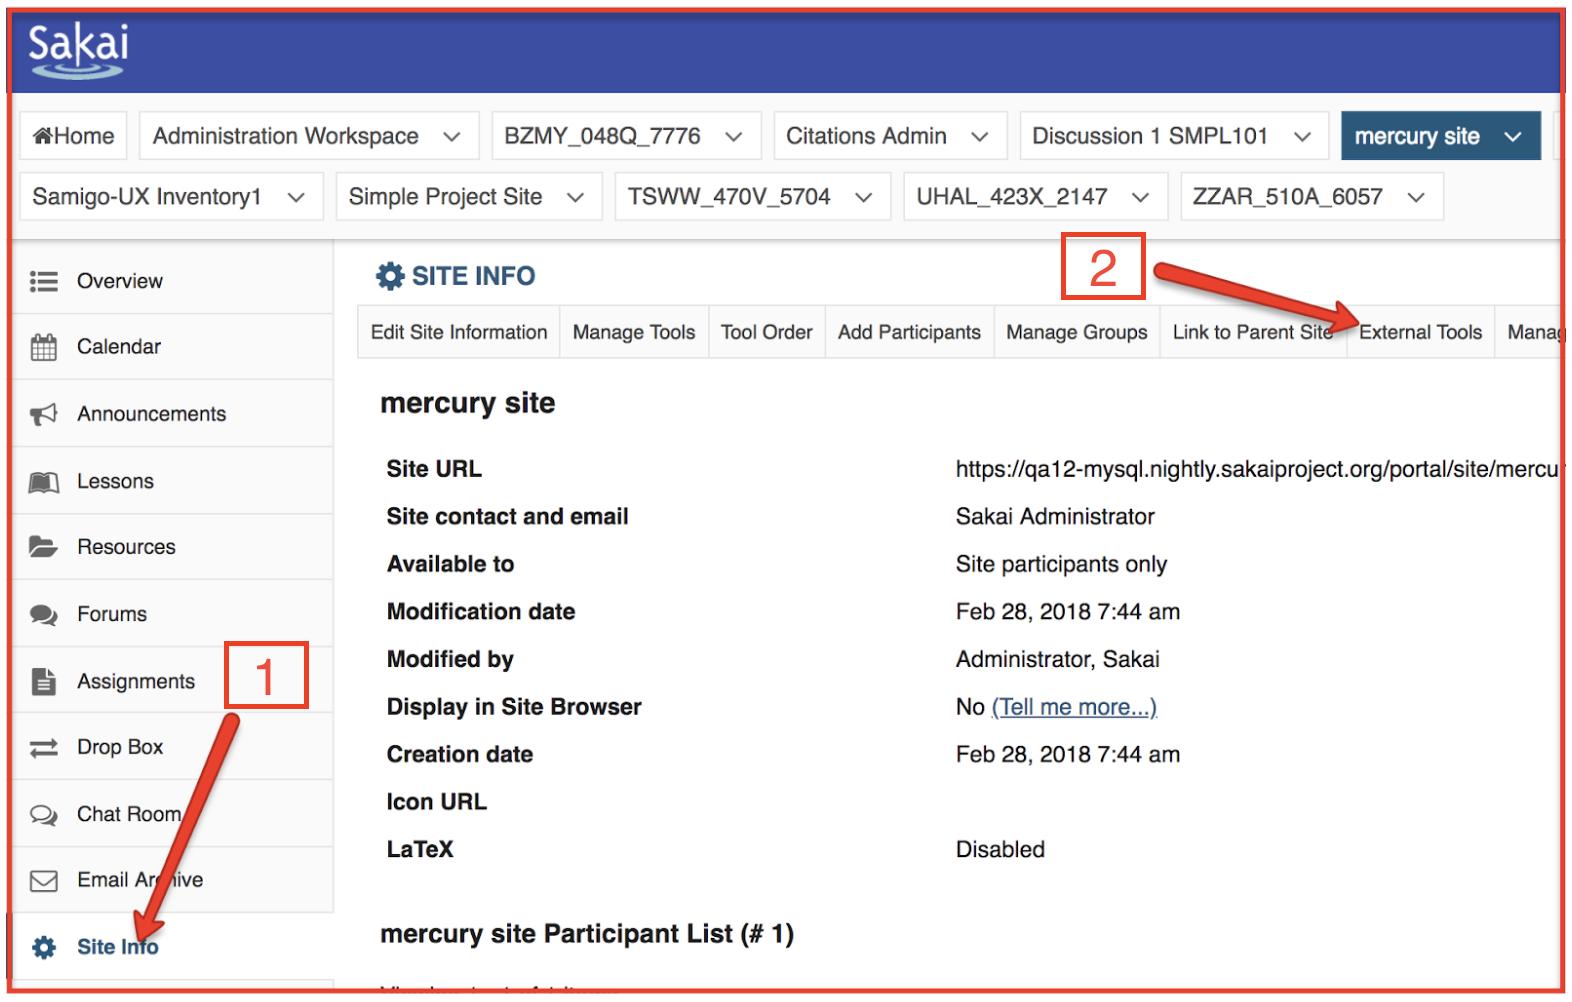 Location of Sakai Site Info - External Tools tab